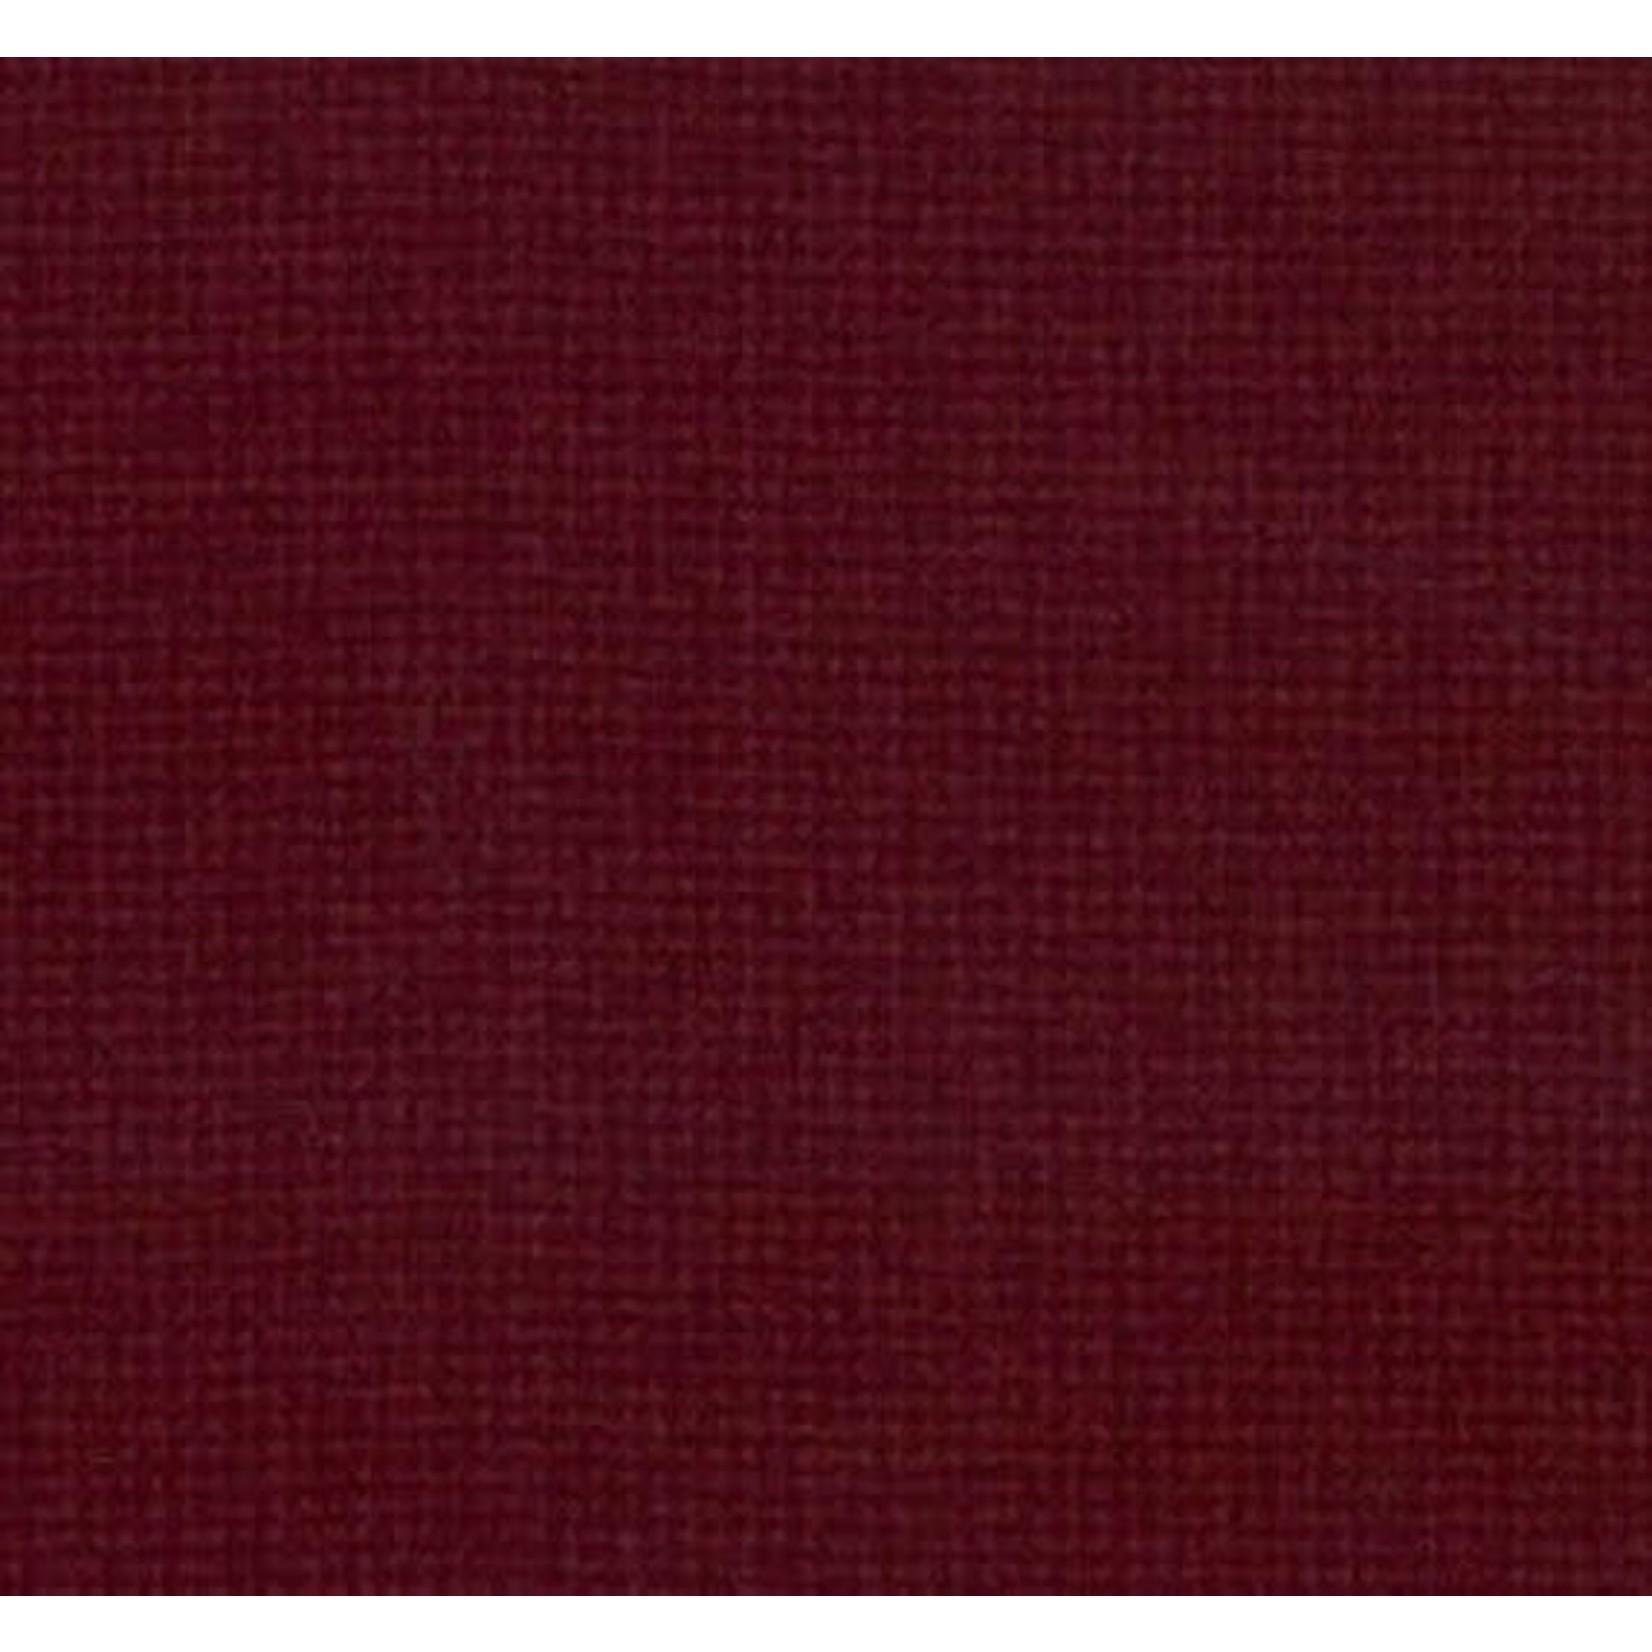 Moda Fabrics 3 Sisters - Kansas Trouble - Red